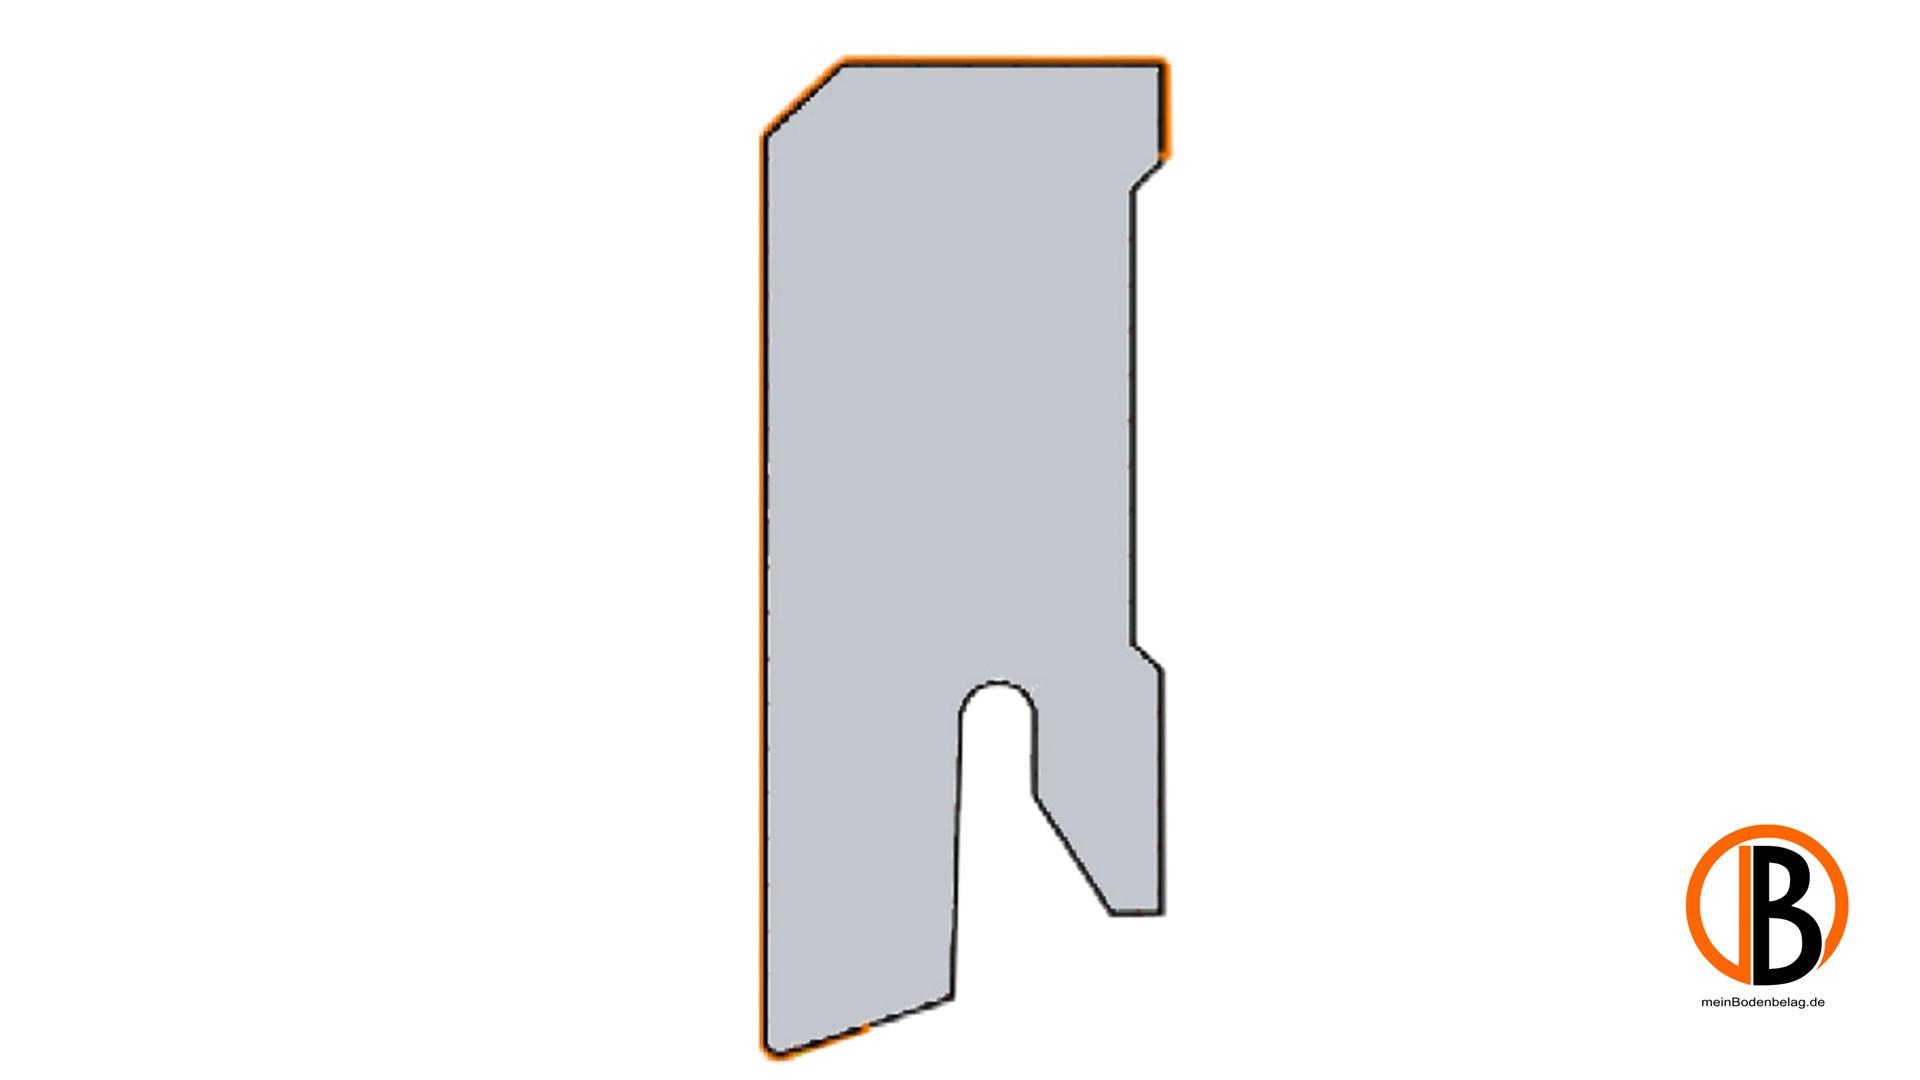 CINQUE KWG SOCKELLEISTEN FÜR ANTIGUA CLASSIC & SYNCHRONY | 10000090;0 | Bild 1